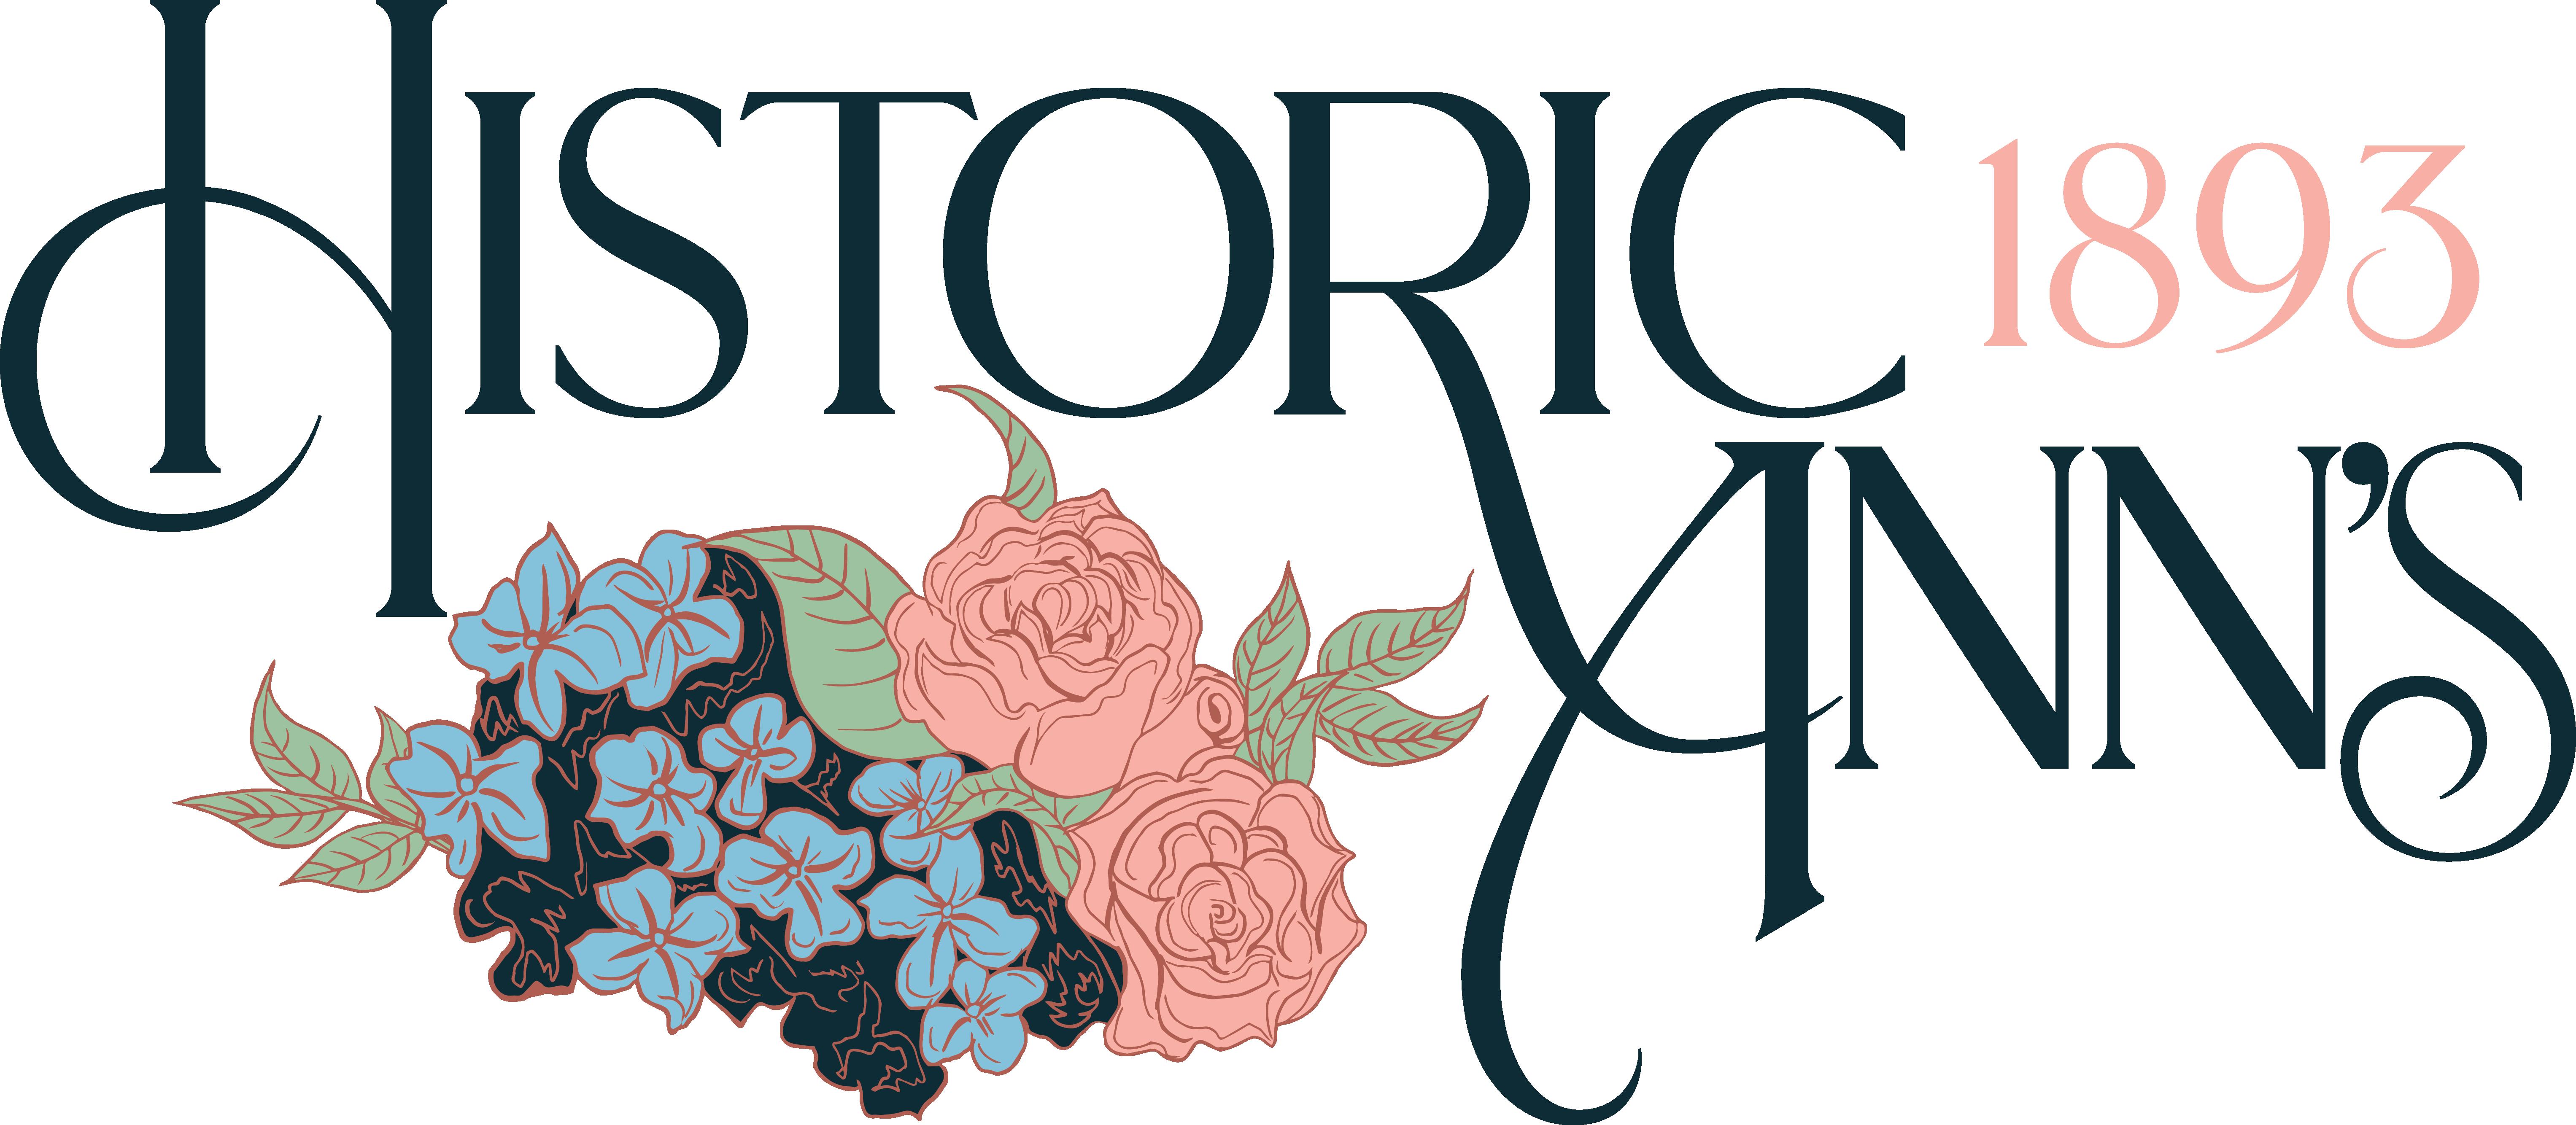 Historic Ann's 1893